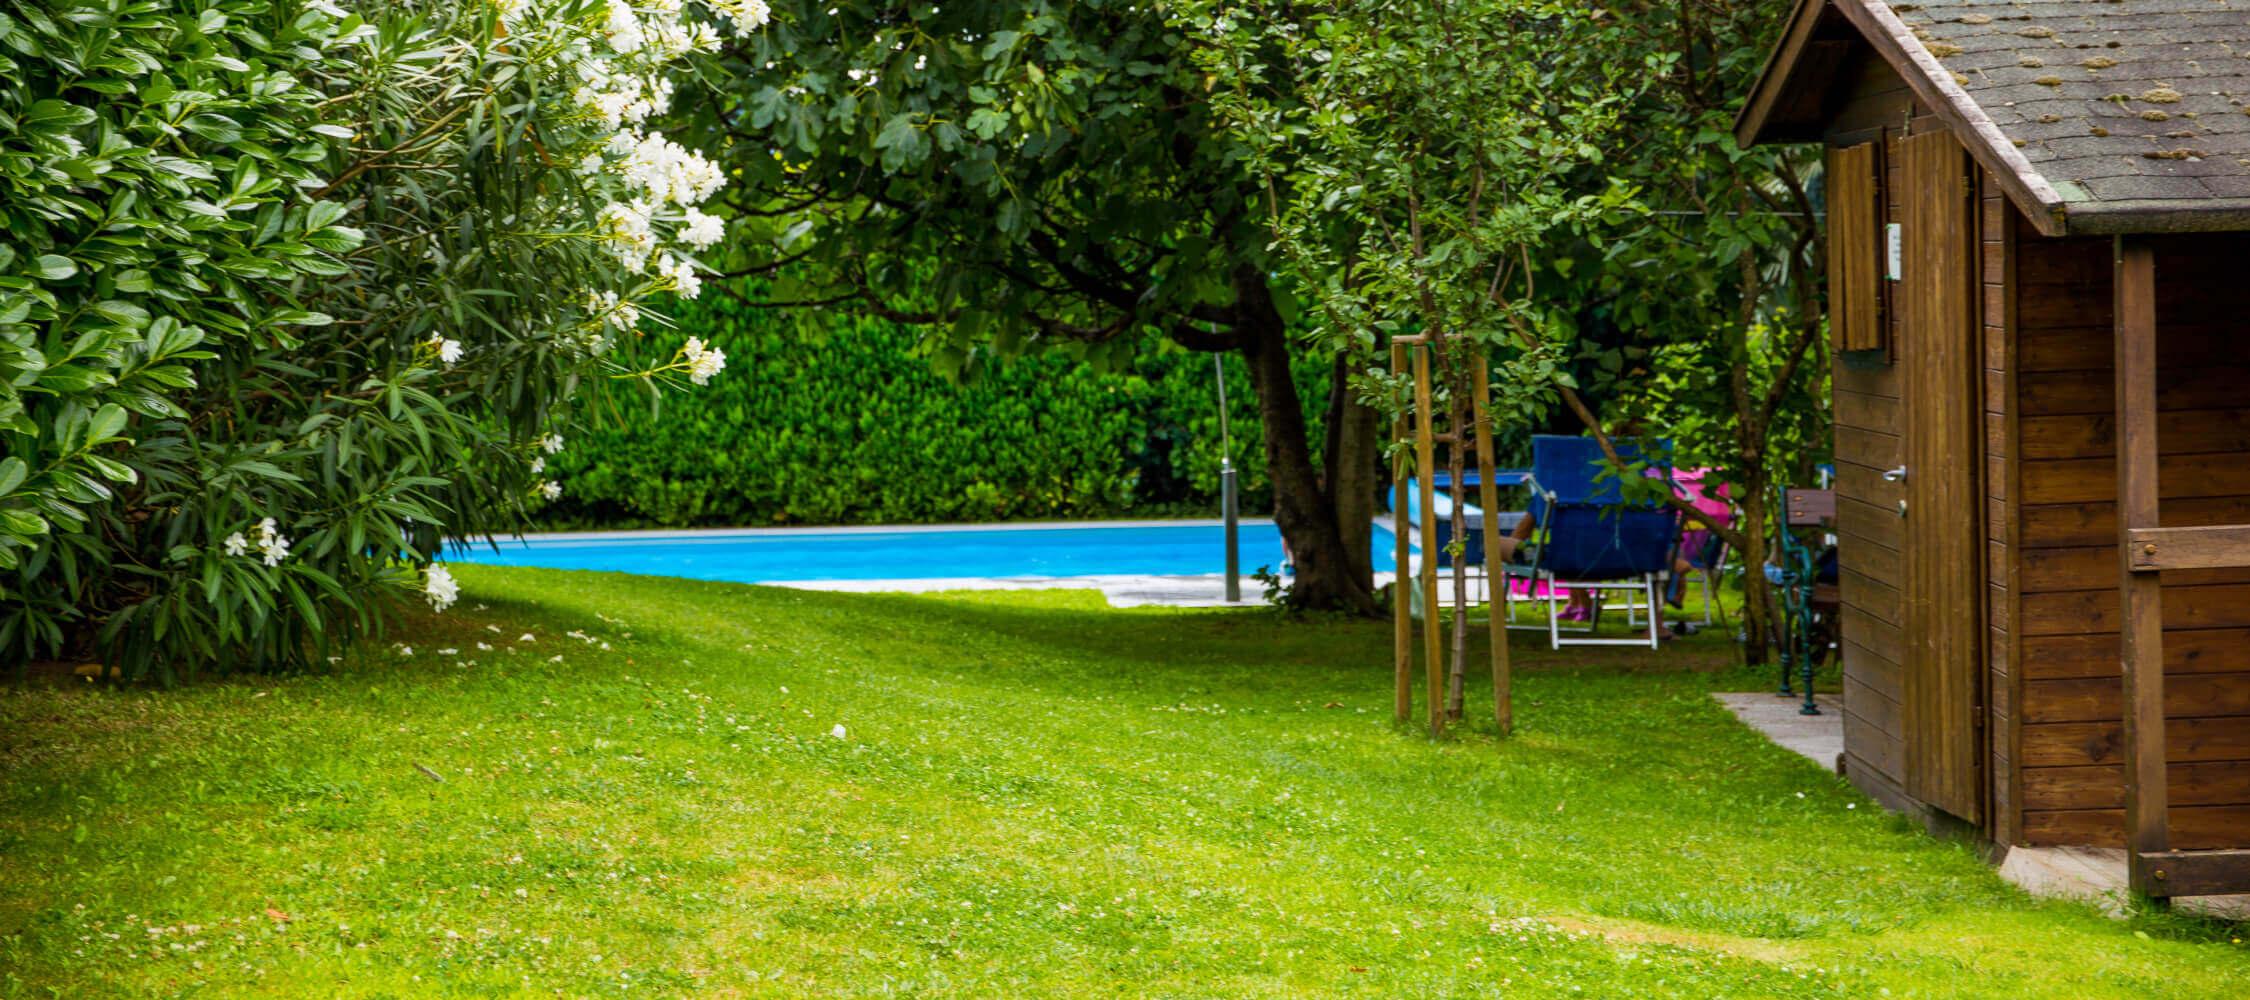 Hotel-Villa-Laurus-Merano-Garten-Anguane-6837-2250x1000